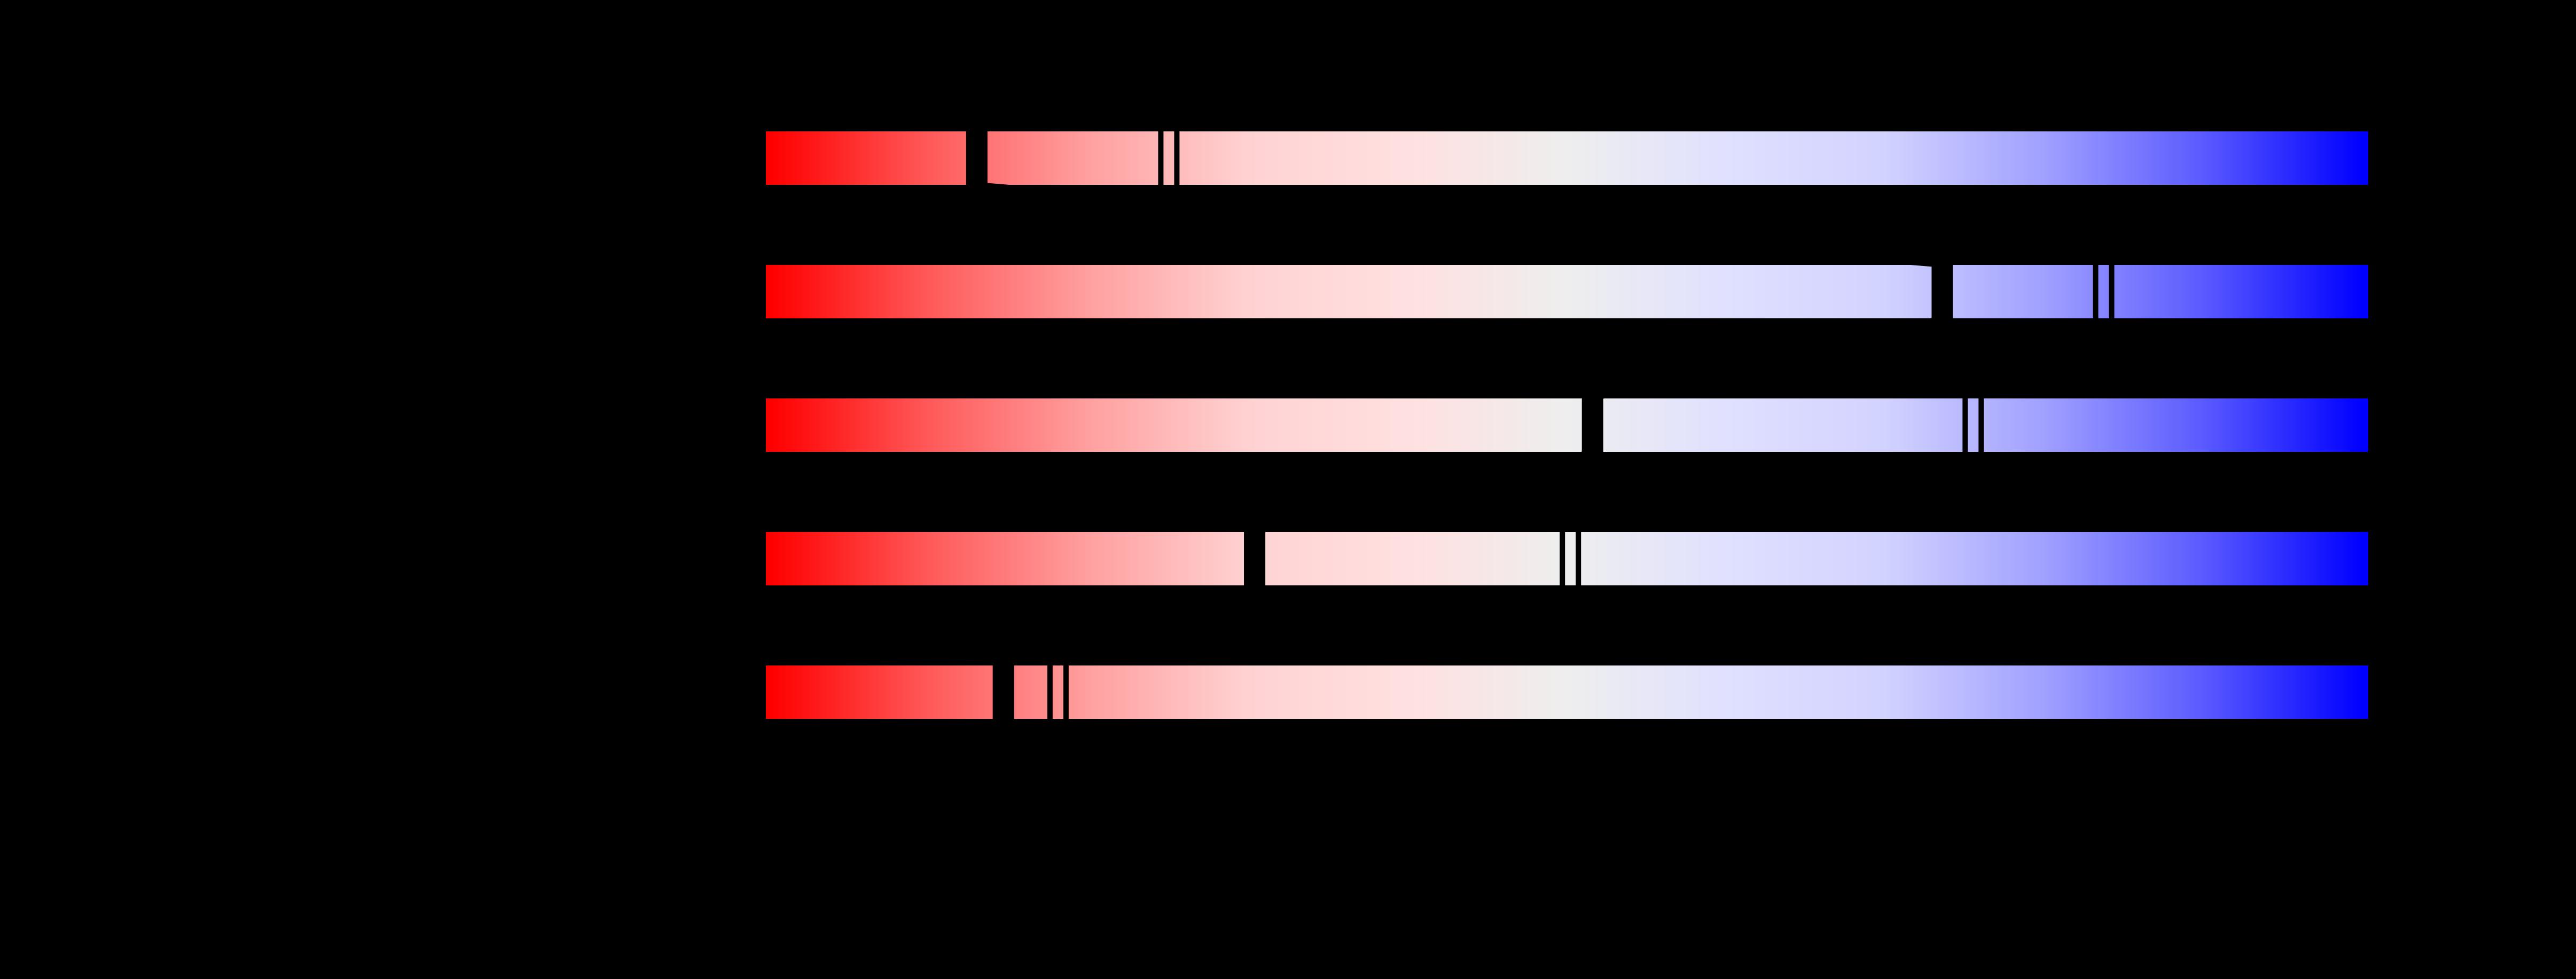 RCSB PDB - 4B8Z: Crystal struc...